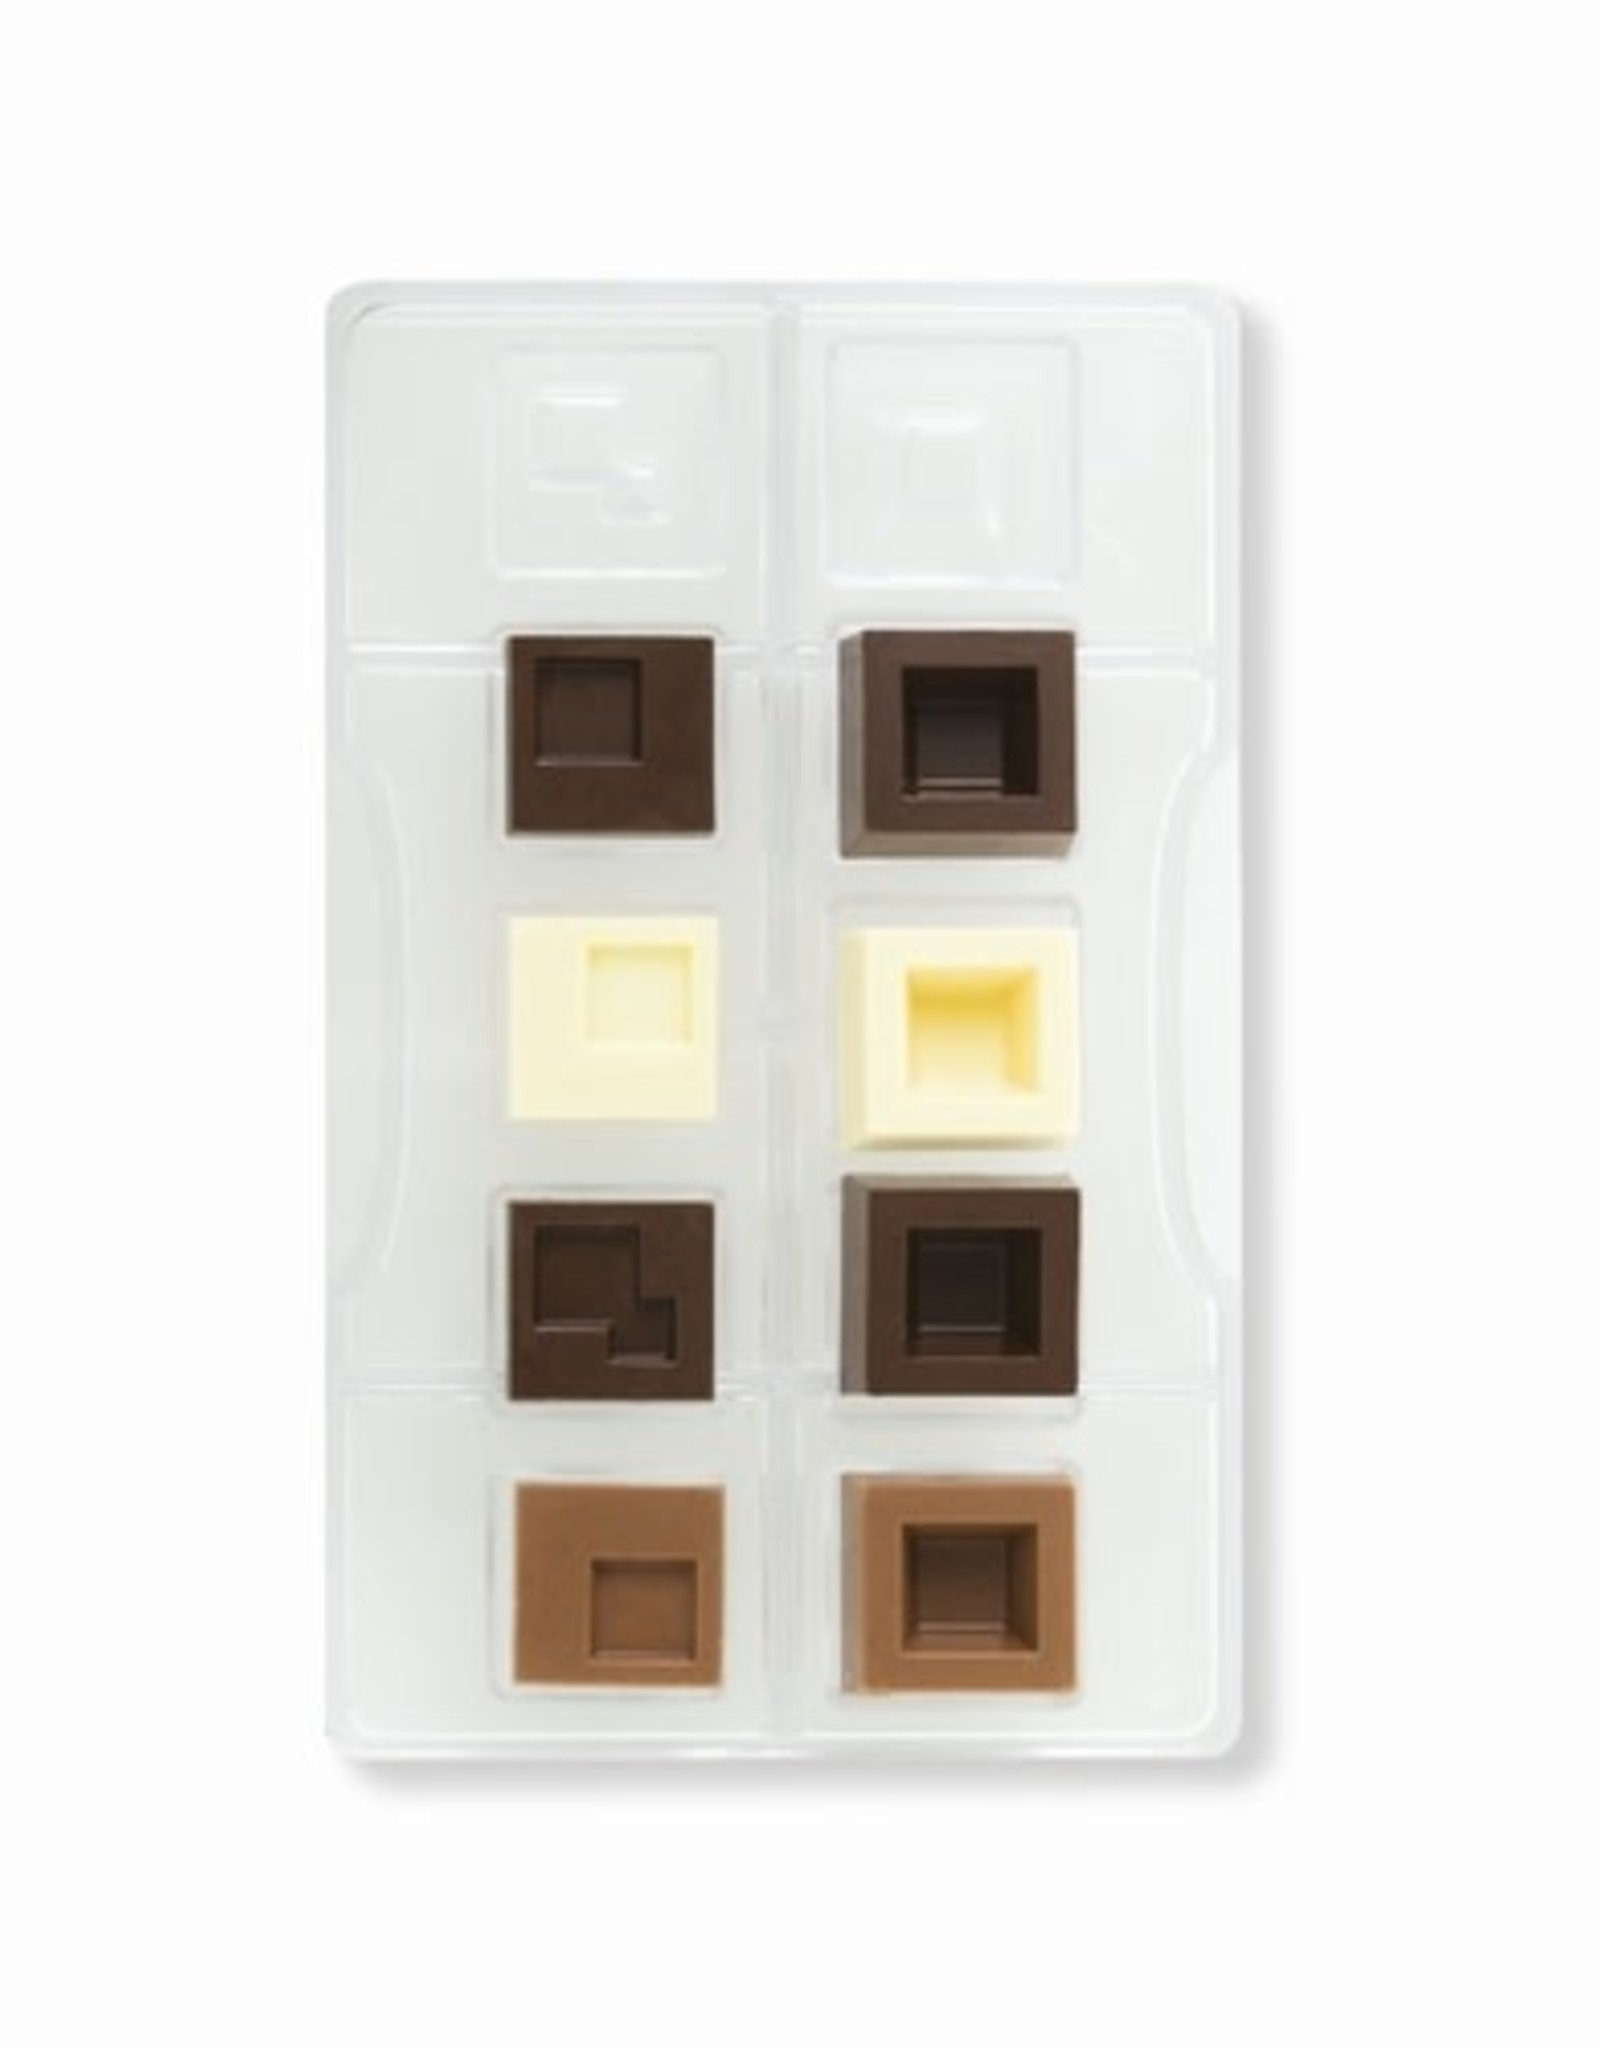 Decora Decora Chocolate Mould Modular Square